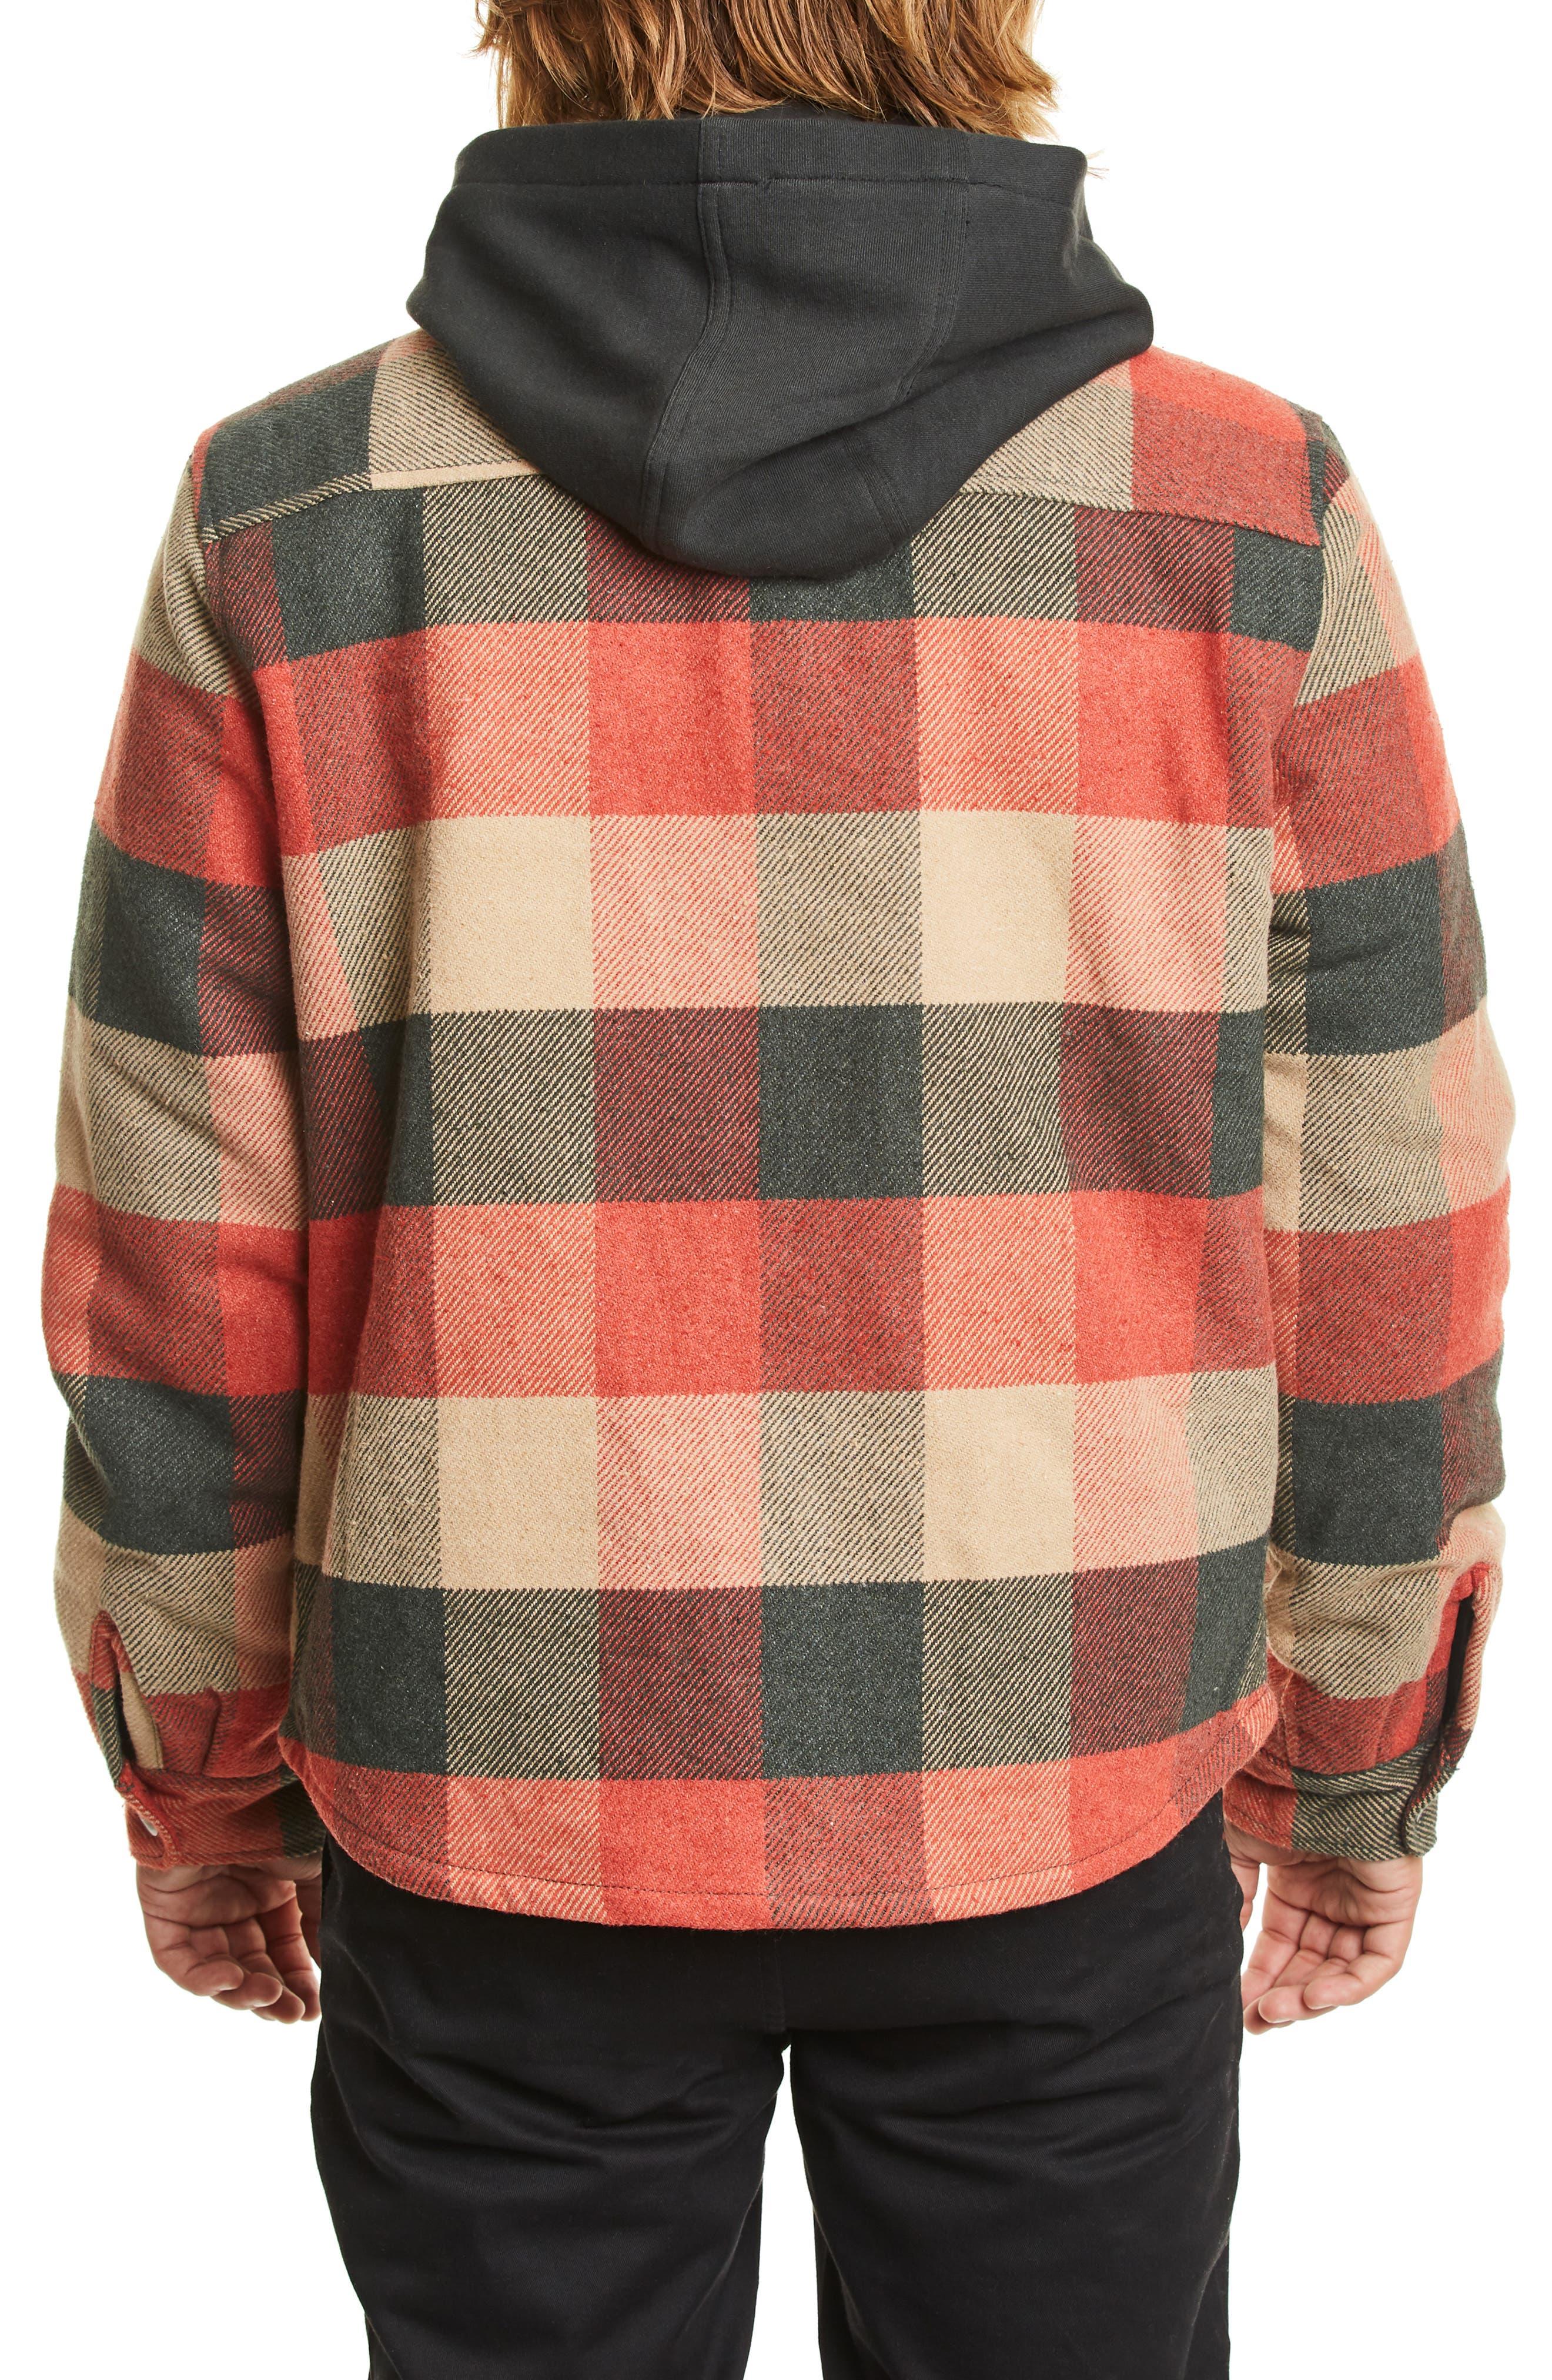 Bowery Jacket,                             Alternate thumbnail 2, color,                             BLACK/ RED